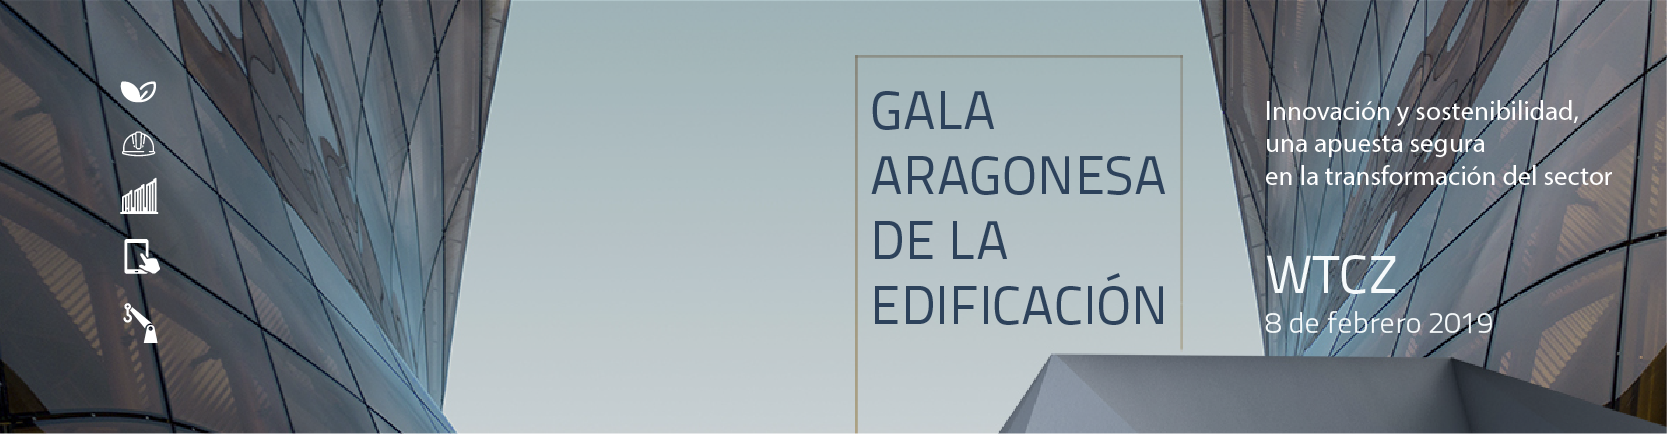 Gala Edificacion Aragonesa